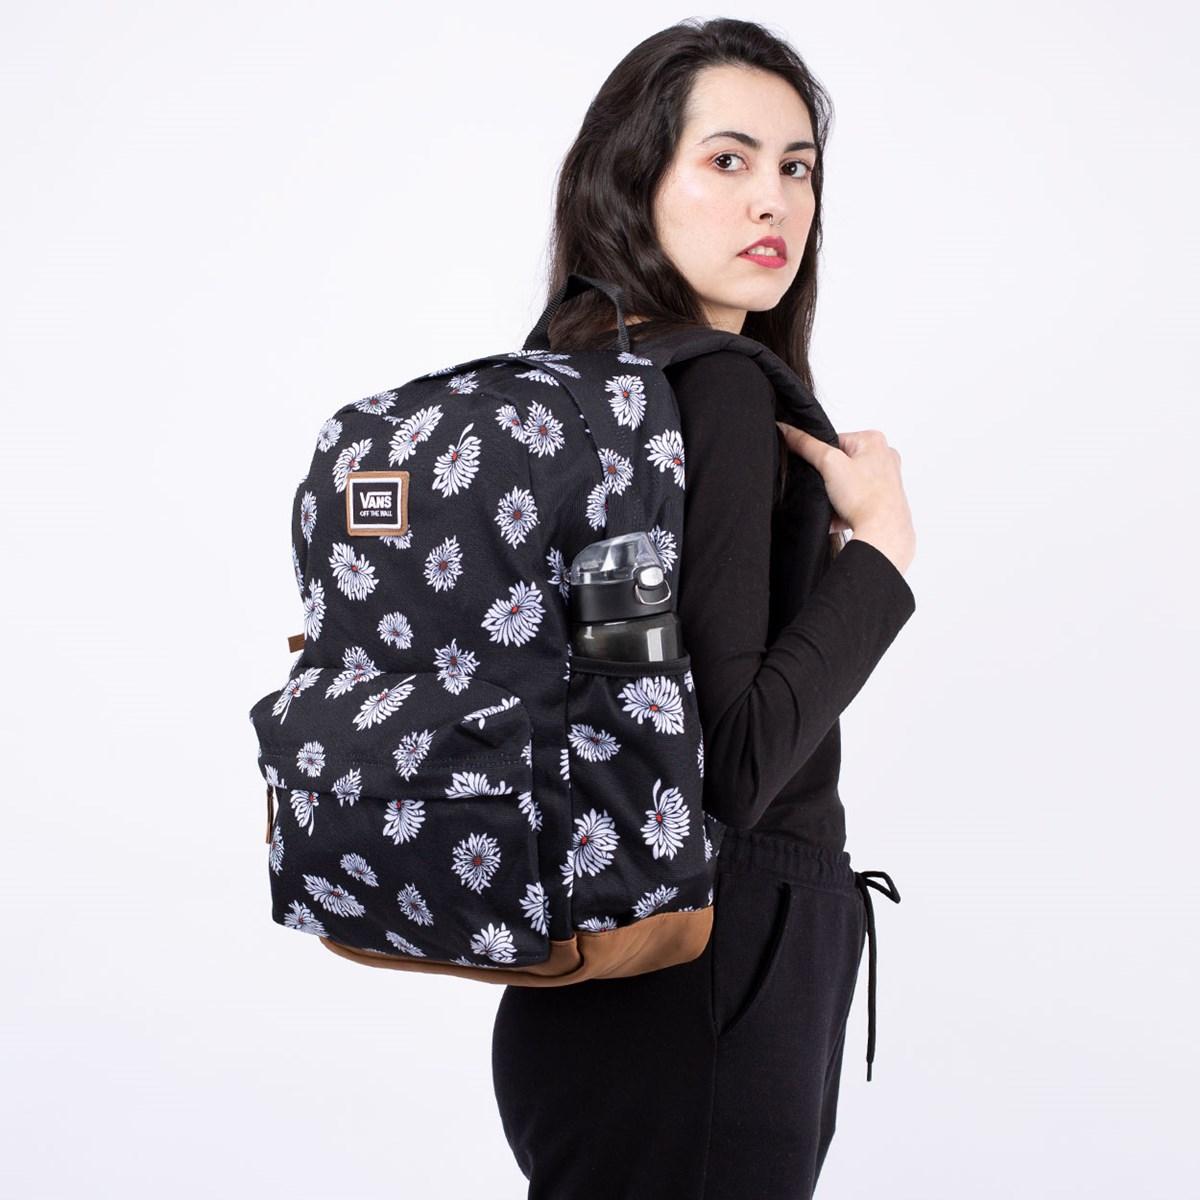 Mochila Vans Realm Plus Backpack Imperfect Floral VN0A34GLZLE